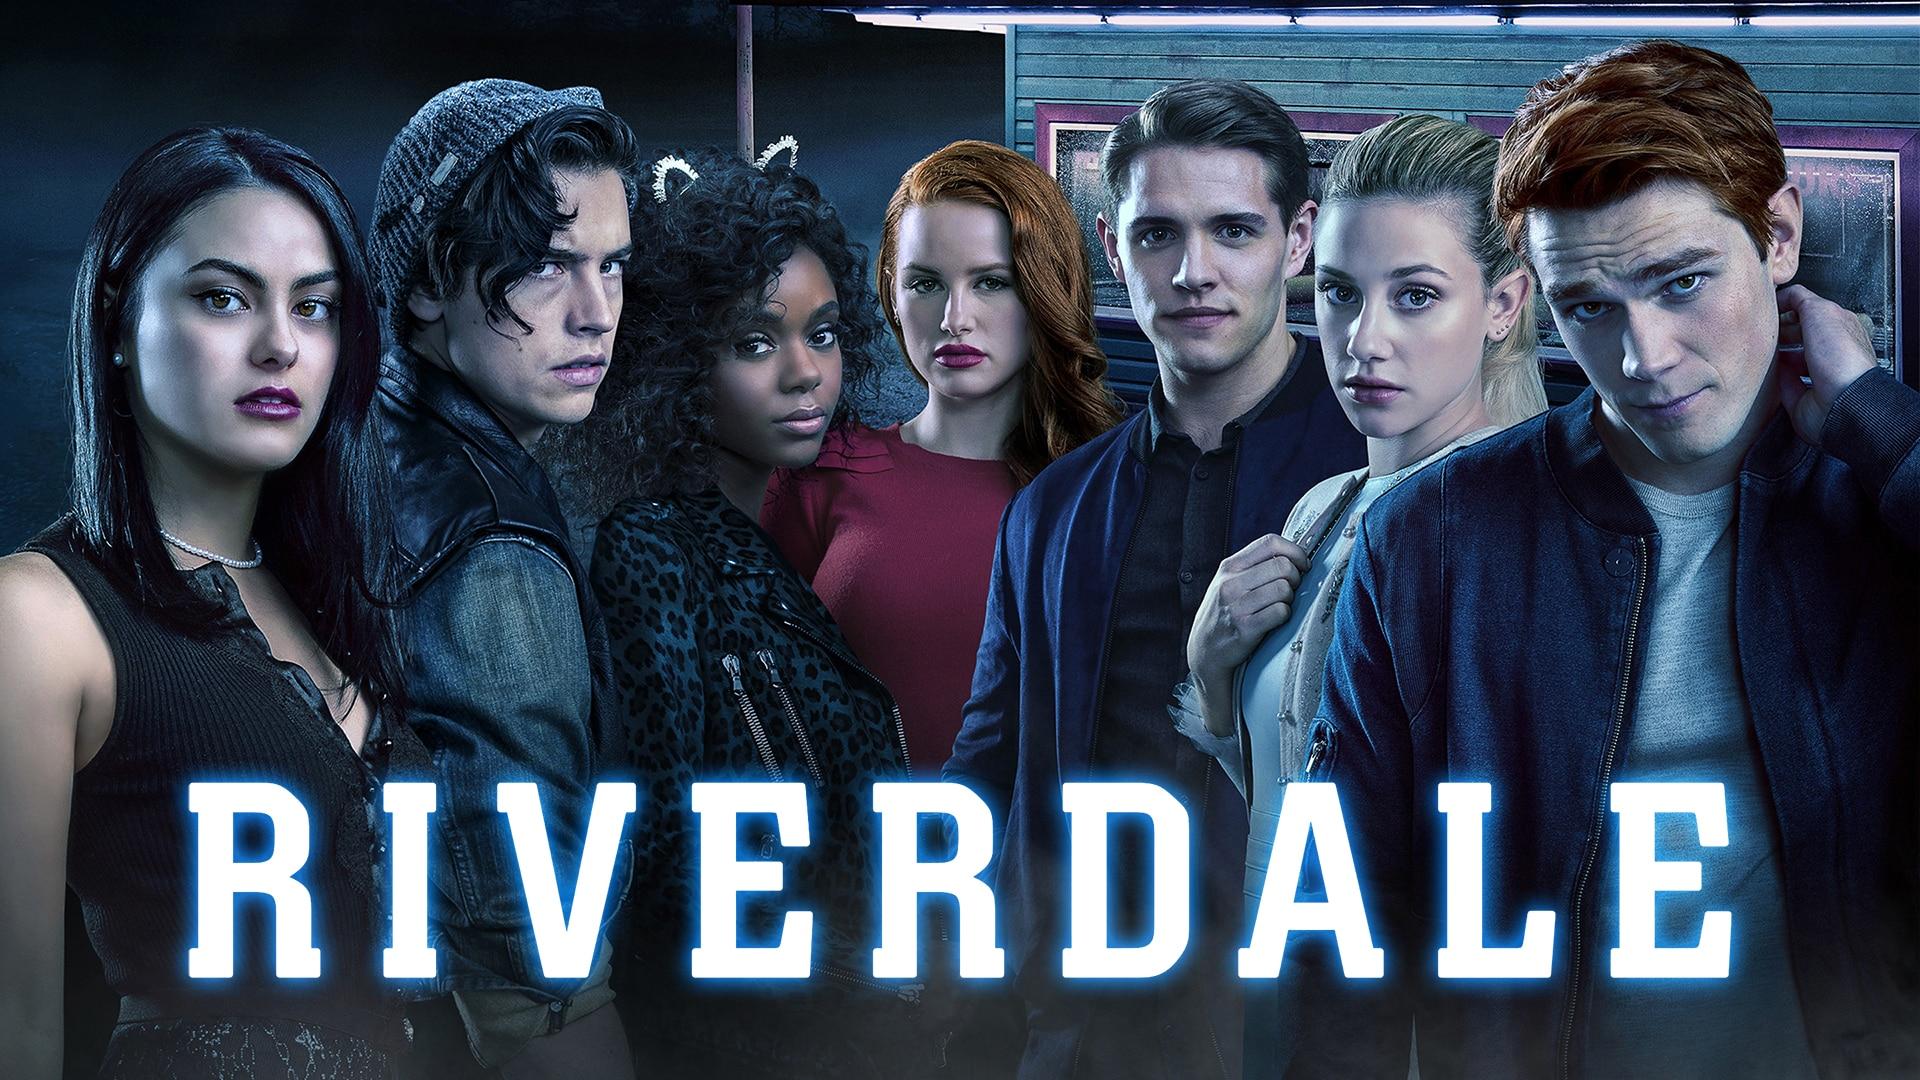 Serie Riverdale